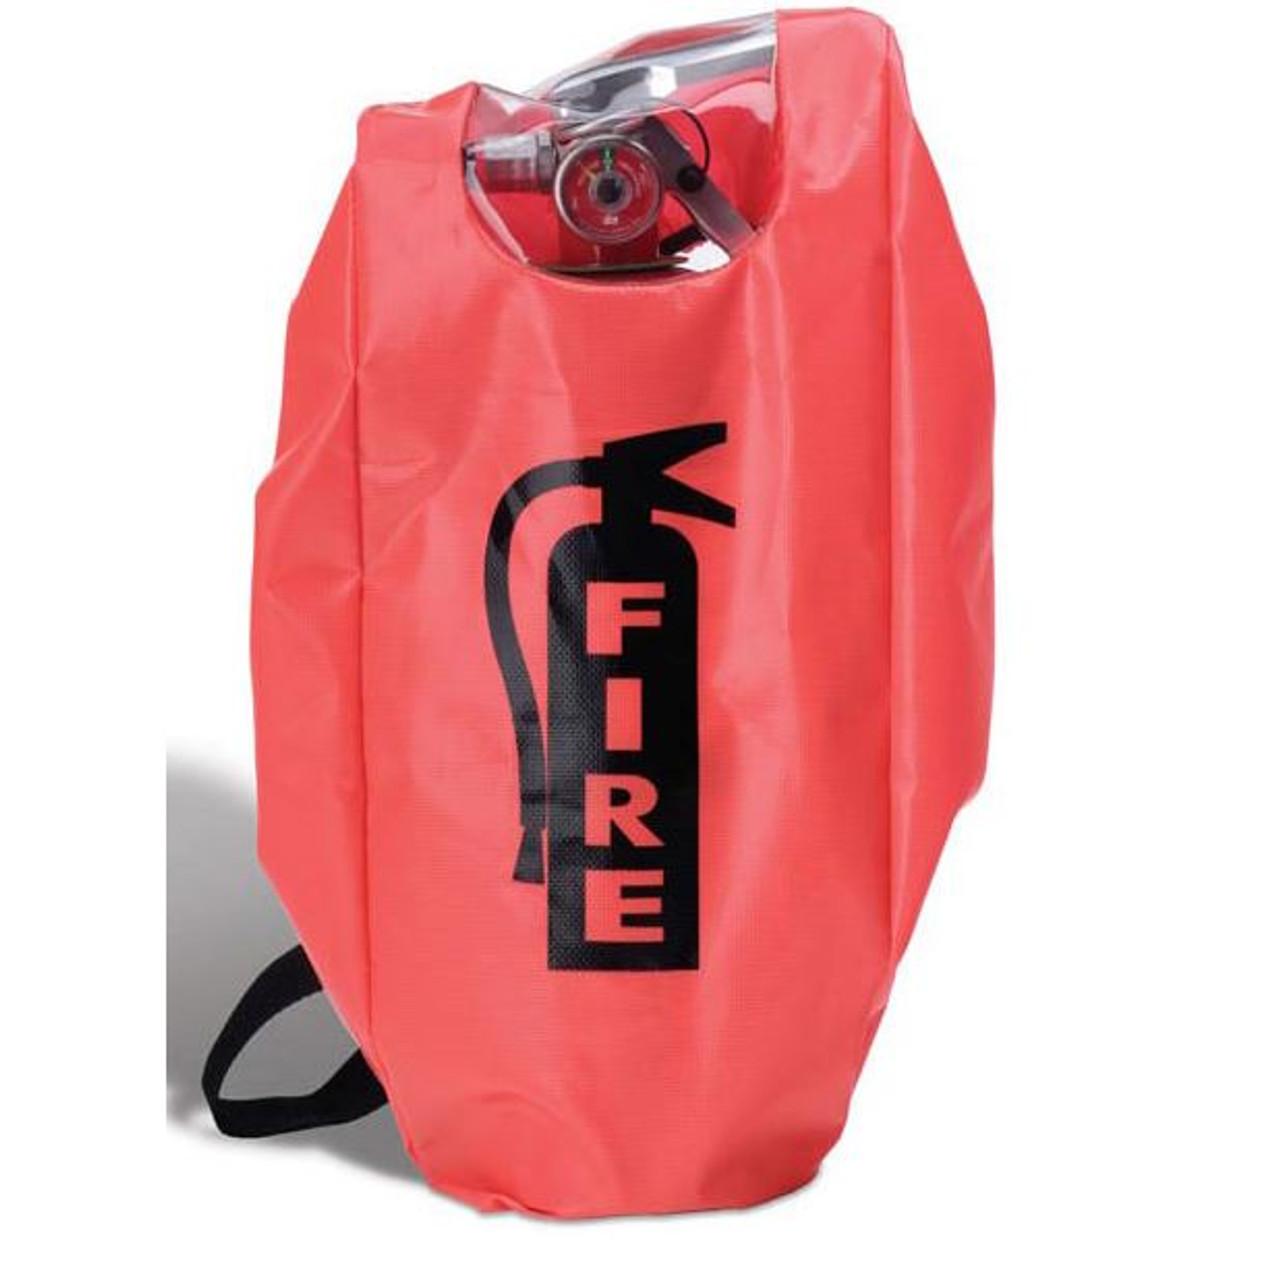 FEC5EW - Small Fire Extinguisher Cover w/ Elastic & Window